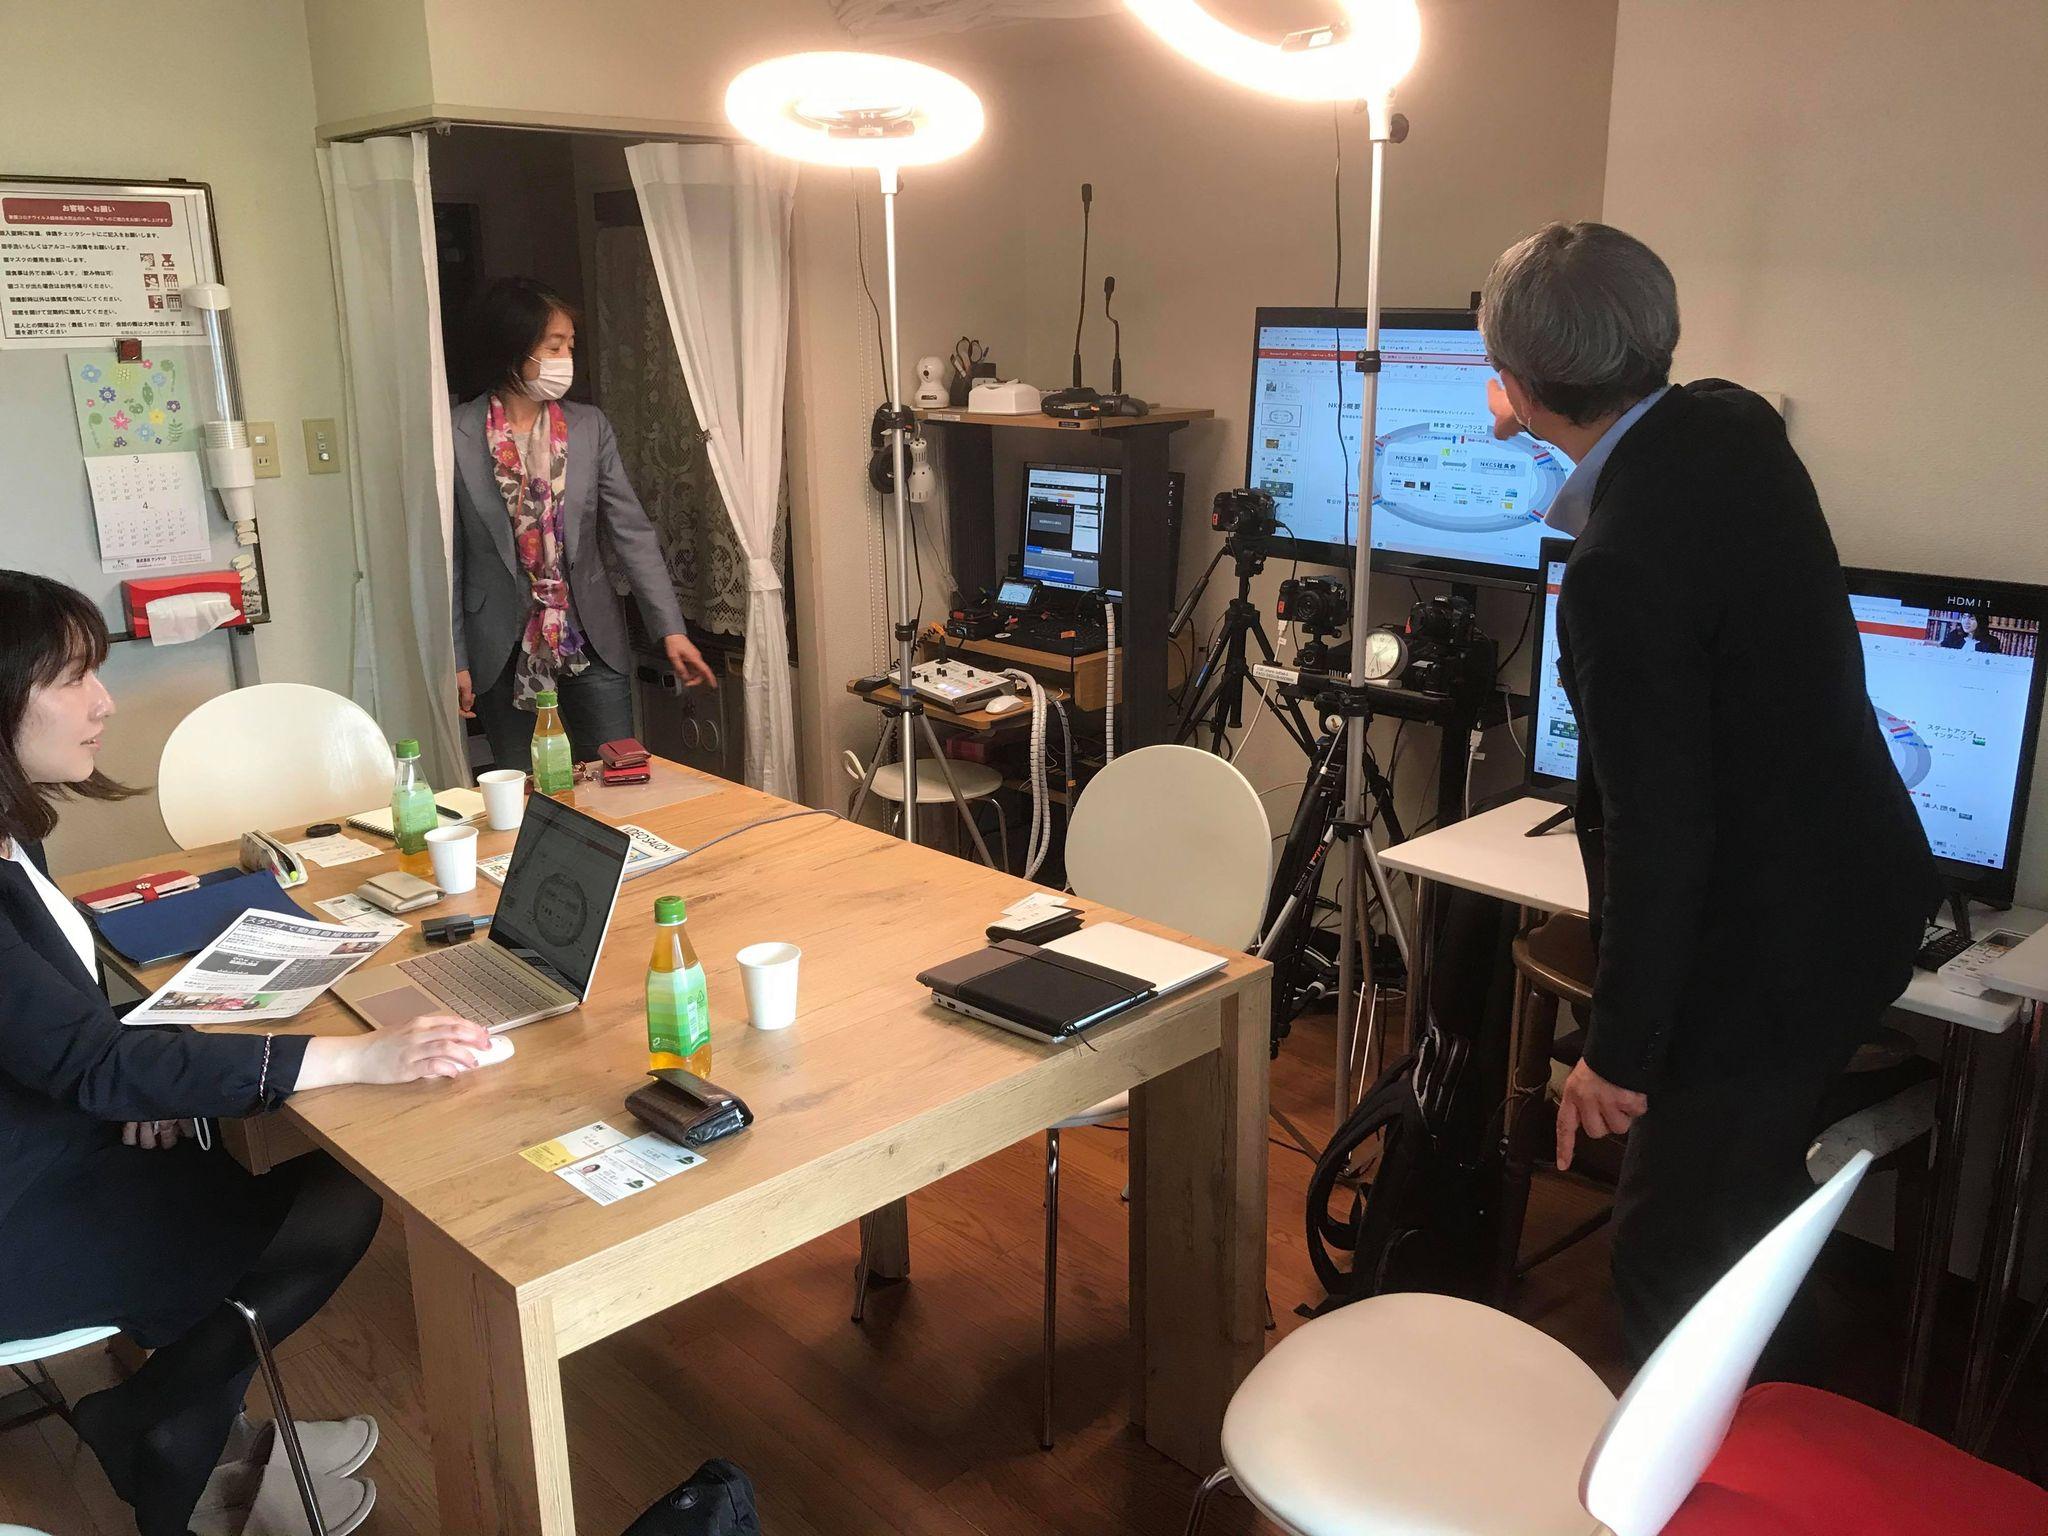 NKCS 六本木撮影スタジオがオープンしました!